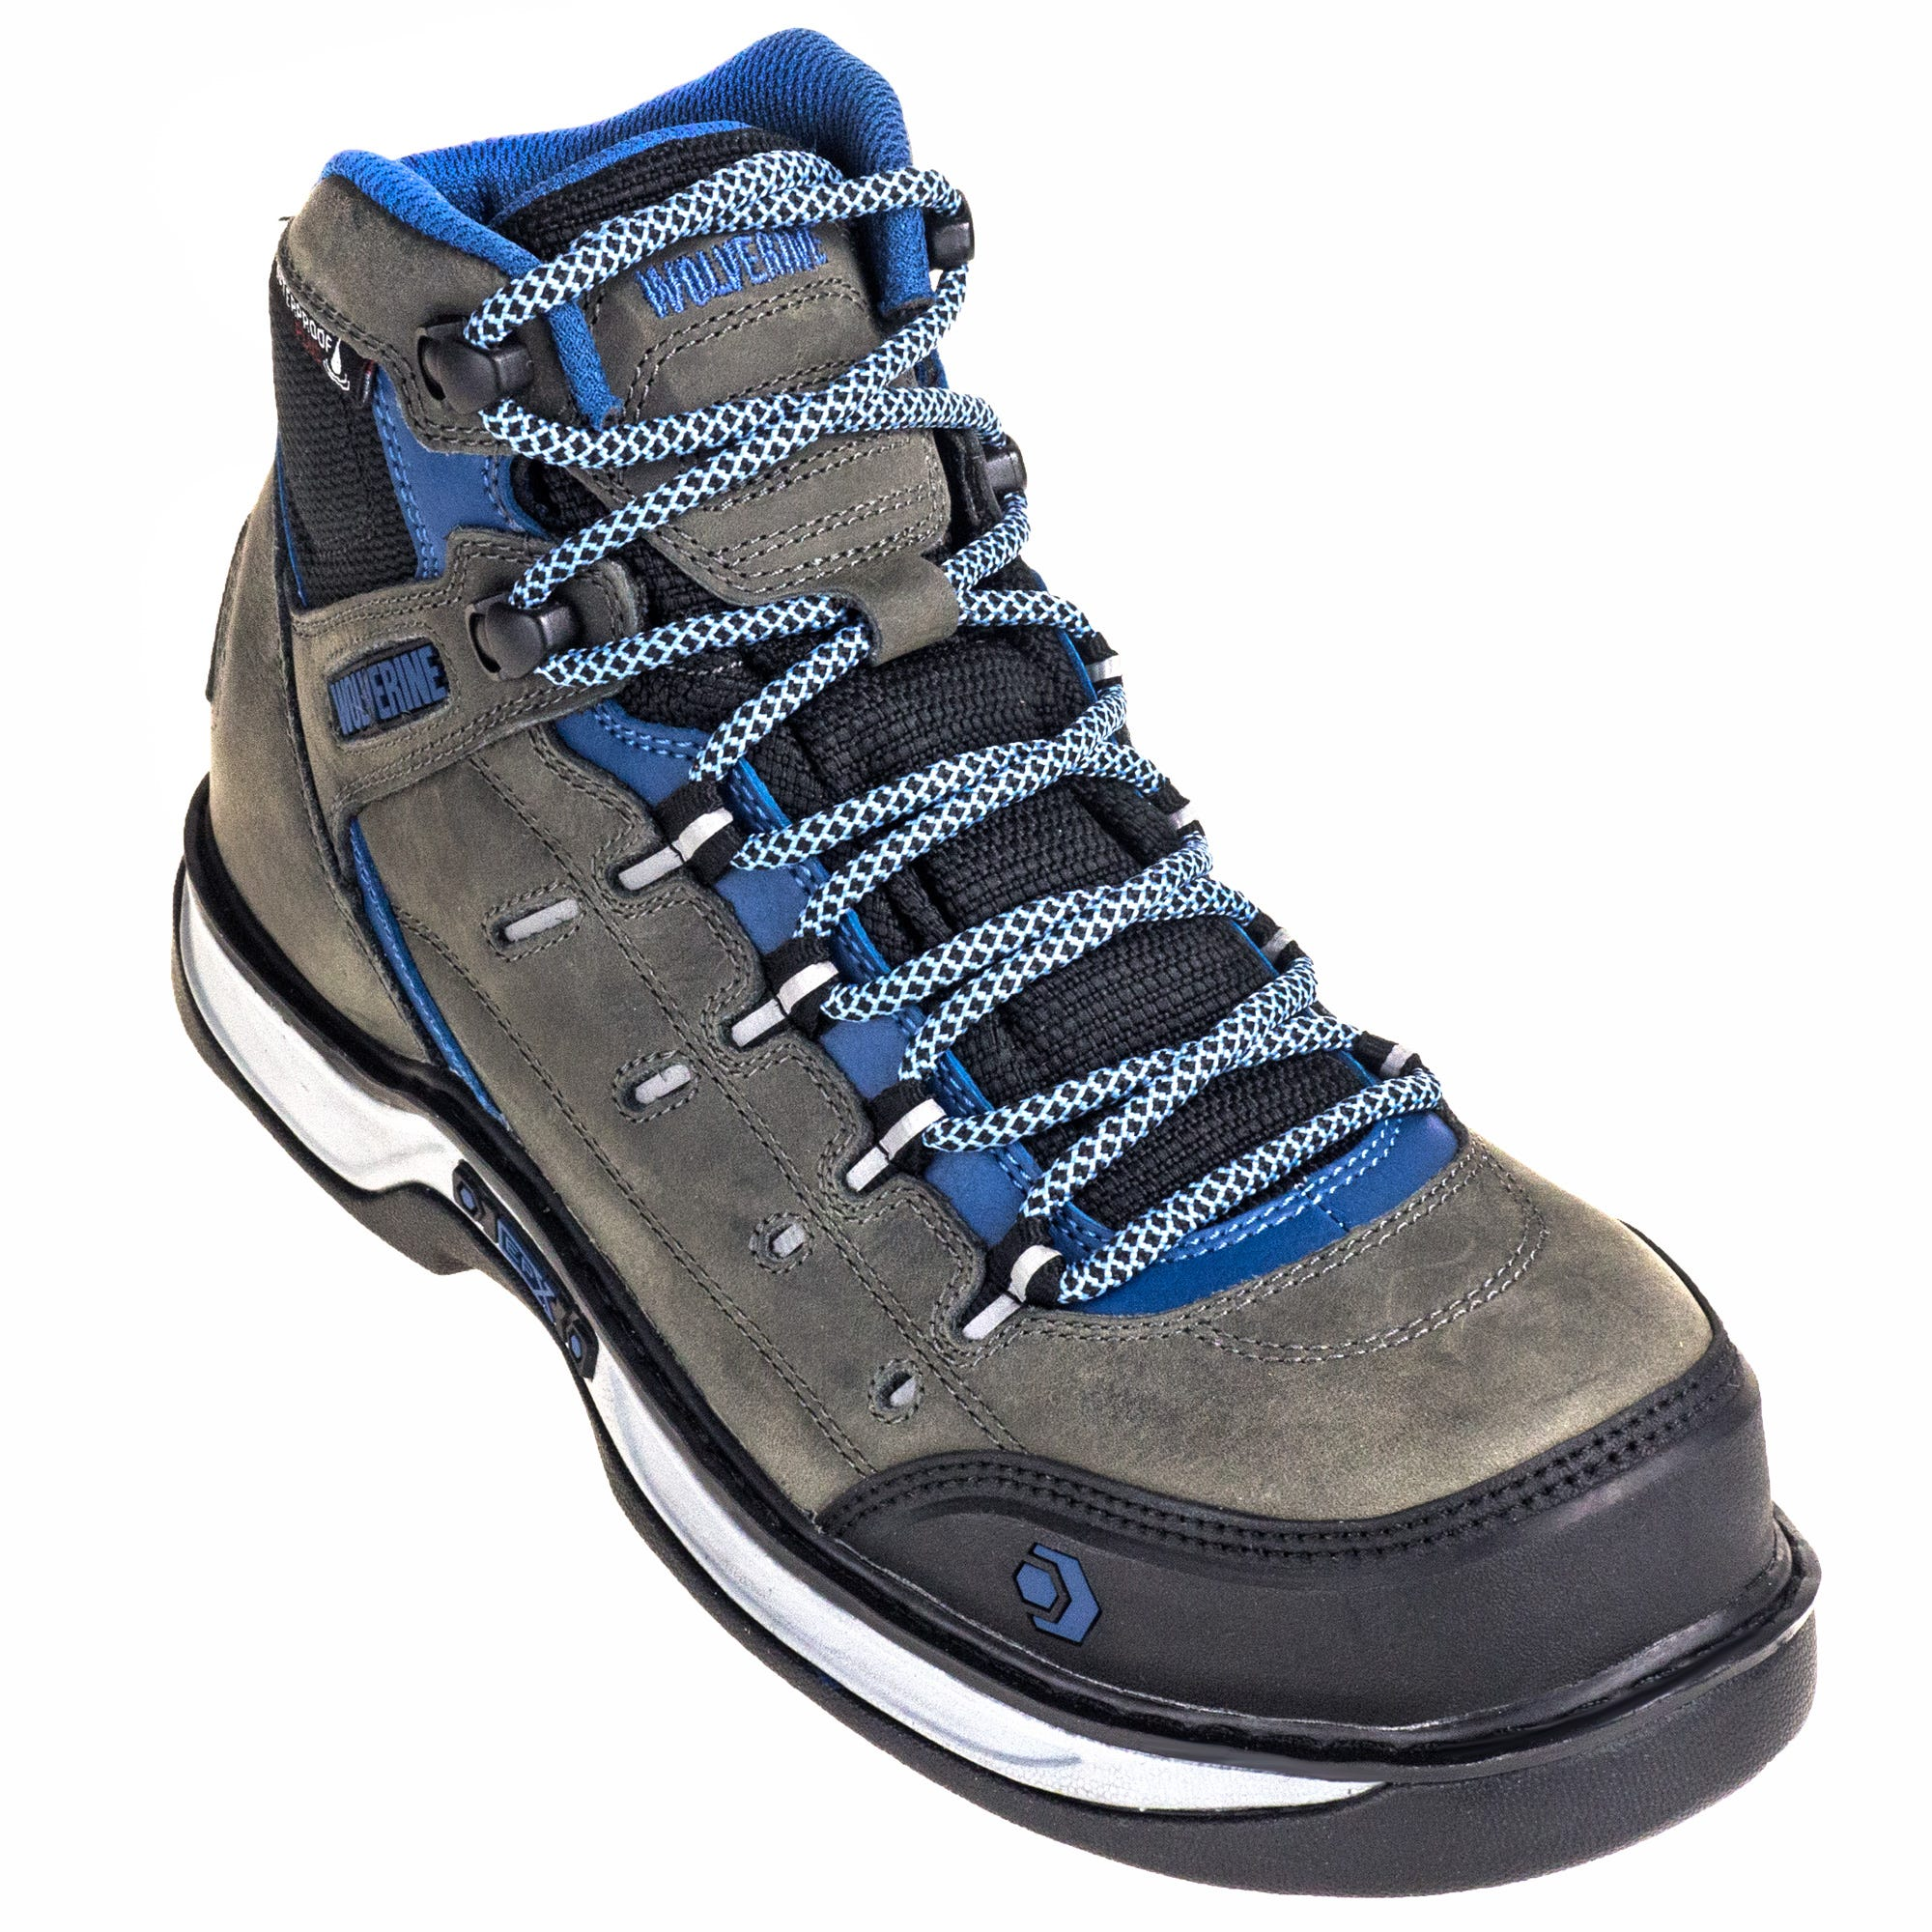 Wolverine Women's 10664 Waterproof CarbonMAX EH Grey/Blue Edge LX Hiker Boots